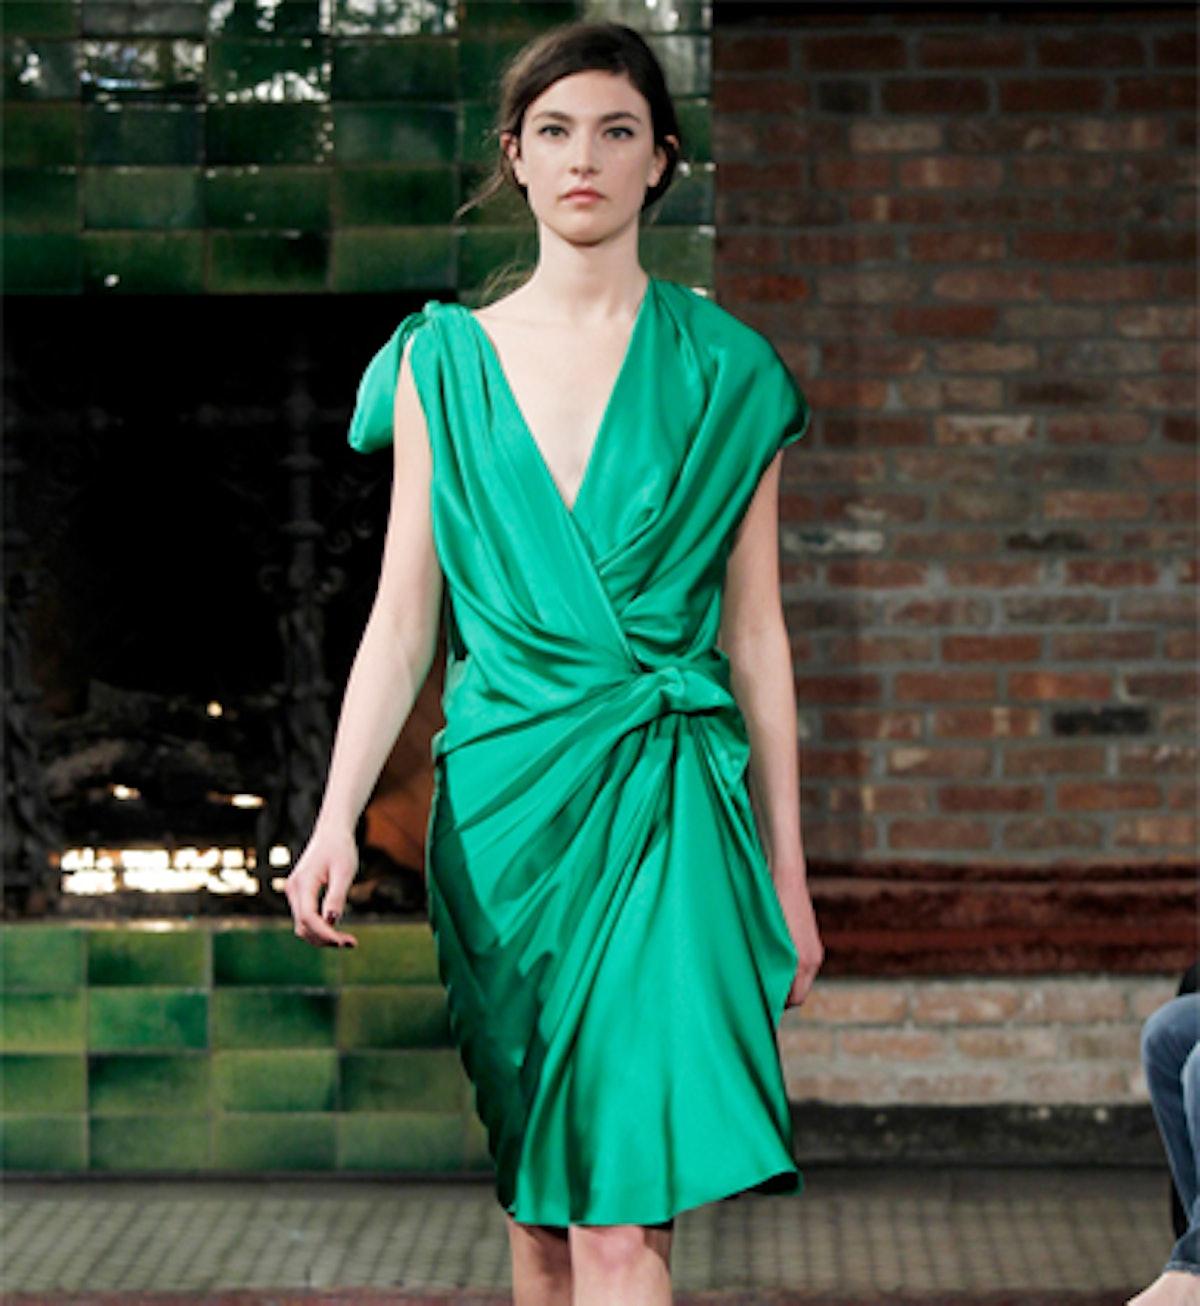 blog-this-weeks-model-jacquelyn-jablonski-05.jpg